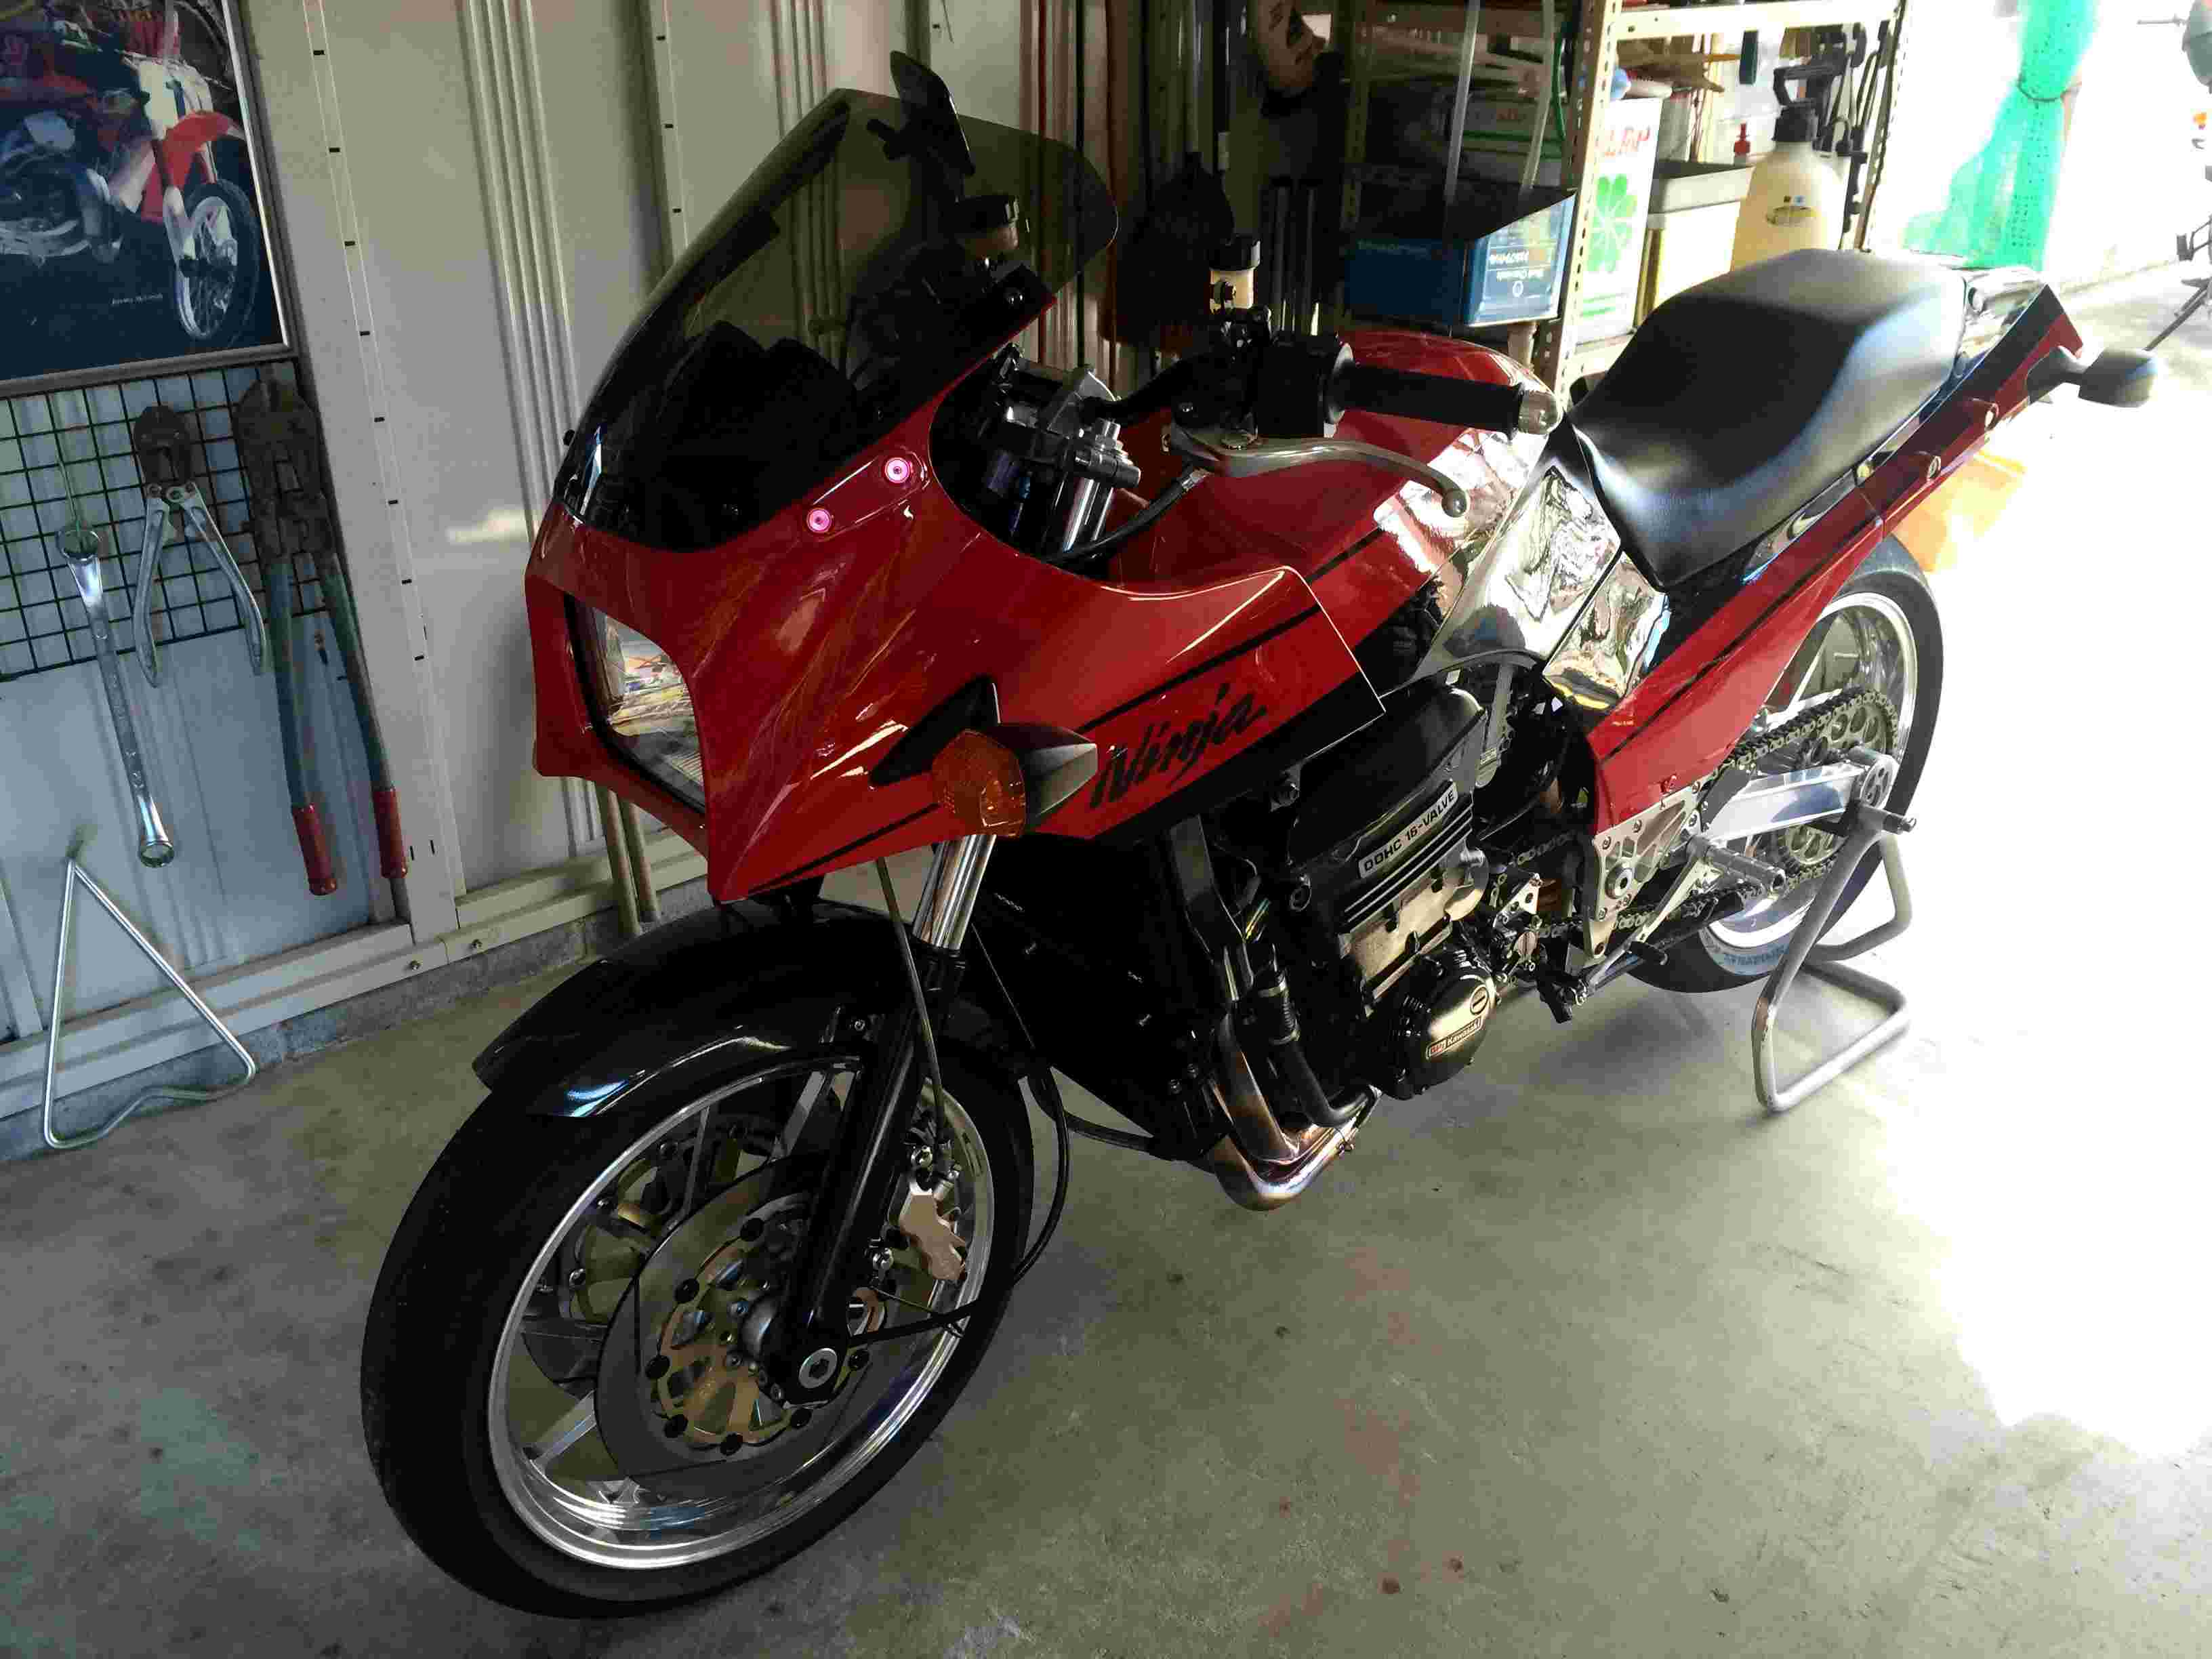 Kawasaki GPZ-R 900 et 750, 1000 RX, ZX 10 TOMCAT - Page 6 Img_4710